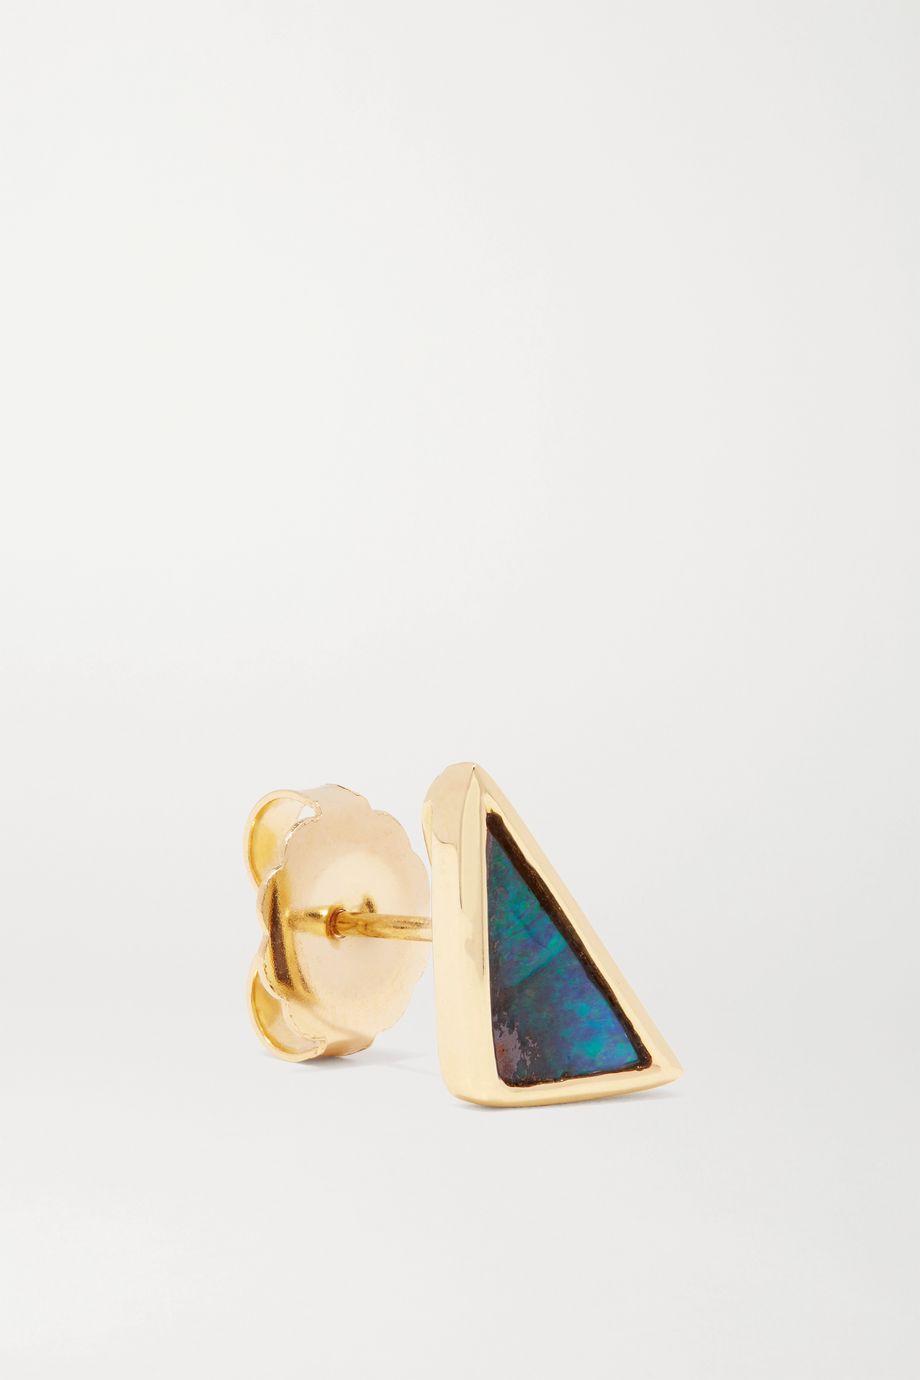 Kimberly McDonald 18-karat gold opal earrings